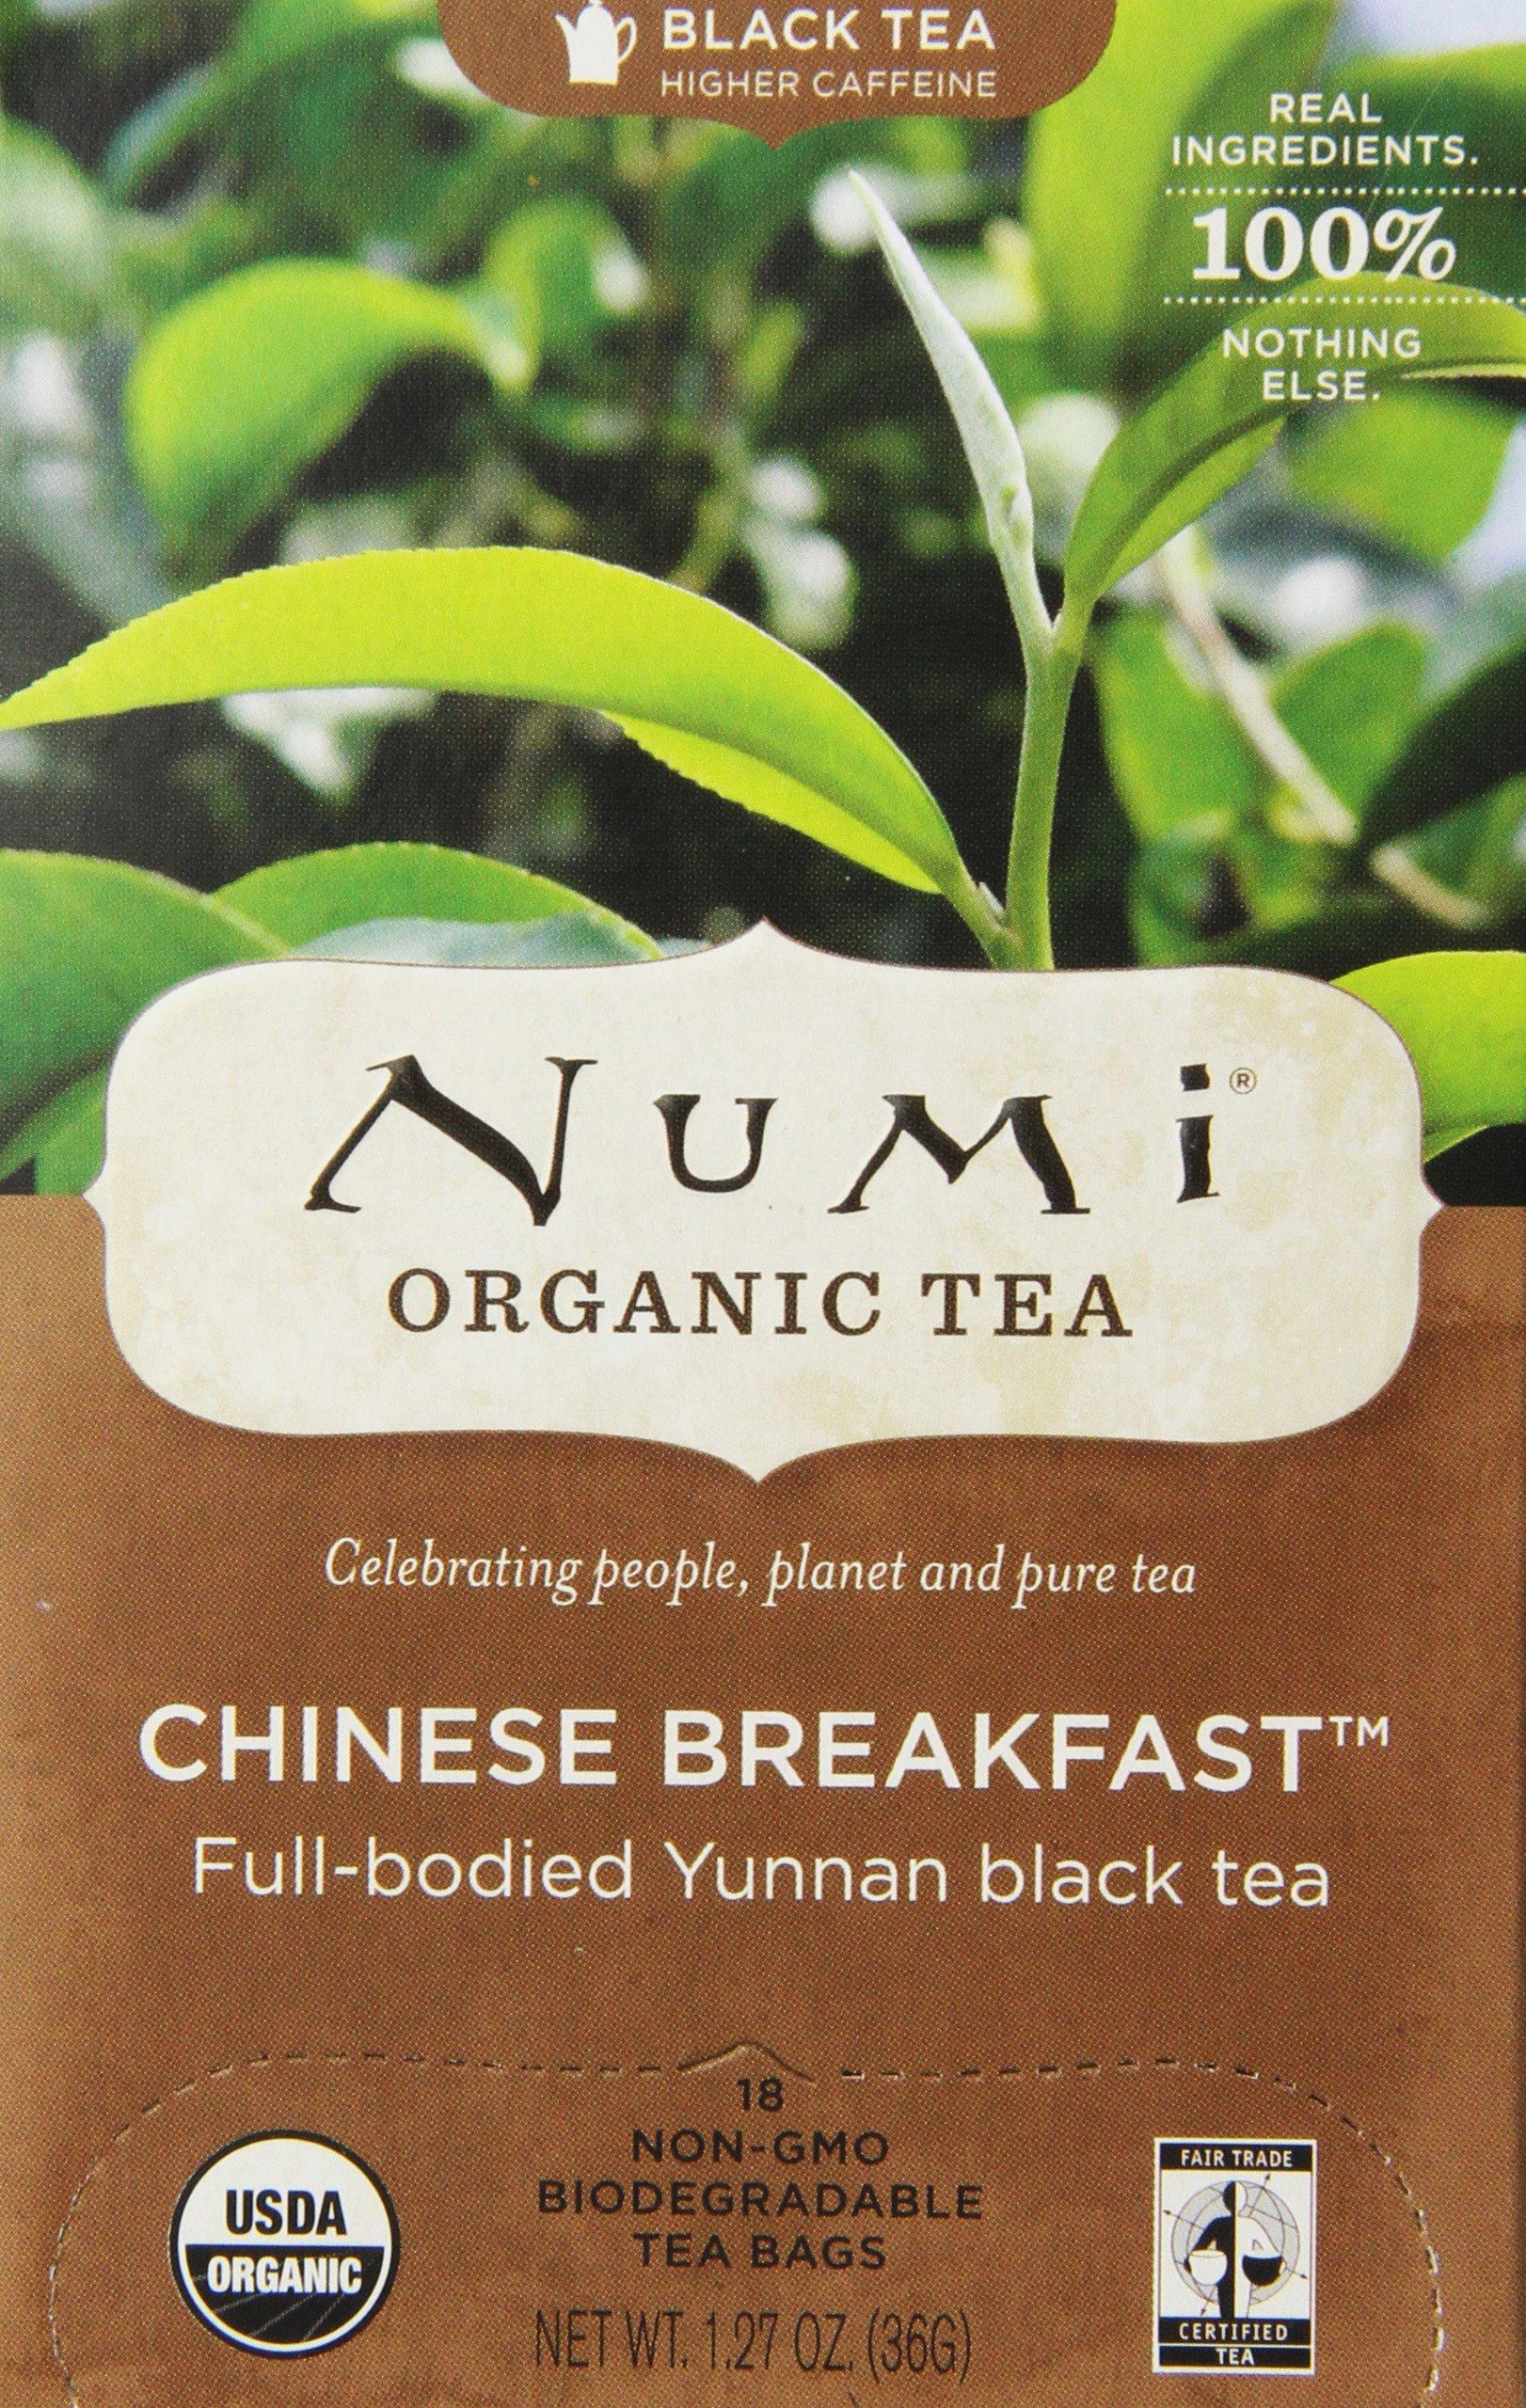 Numi Organic Tea Chinese Breakfast, Full Leaf Black Tea, 18 Count non-GMO Tea Bags